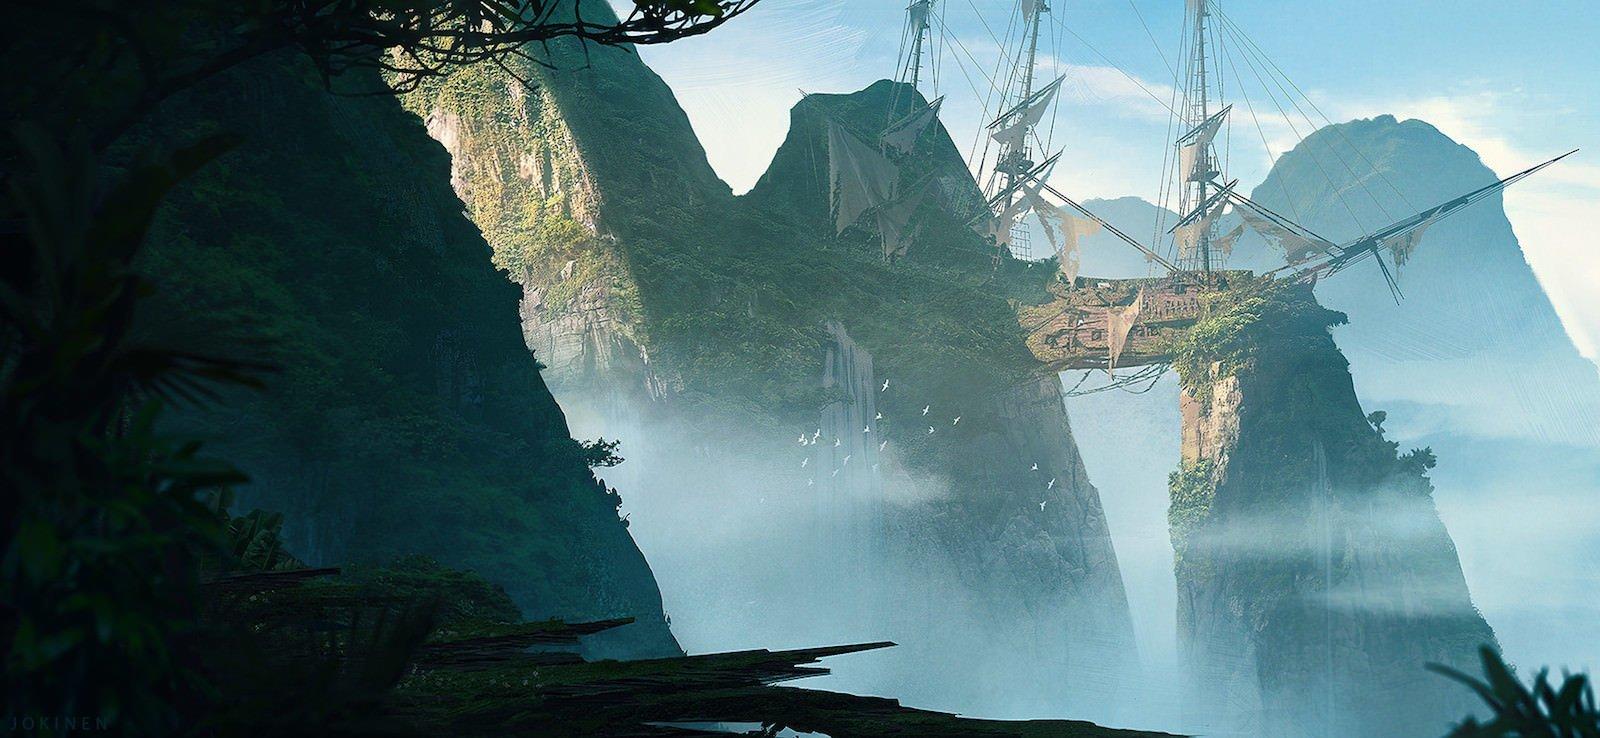 Shipwreck Valley искусство, картины, рисунки, юхани йокинен